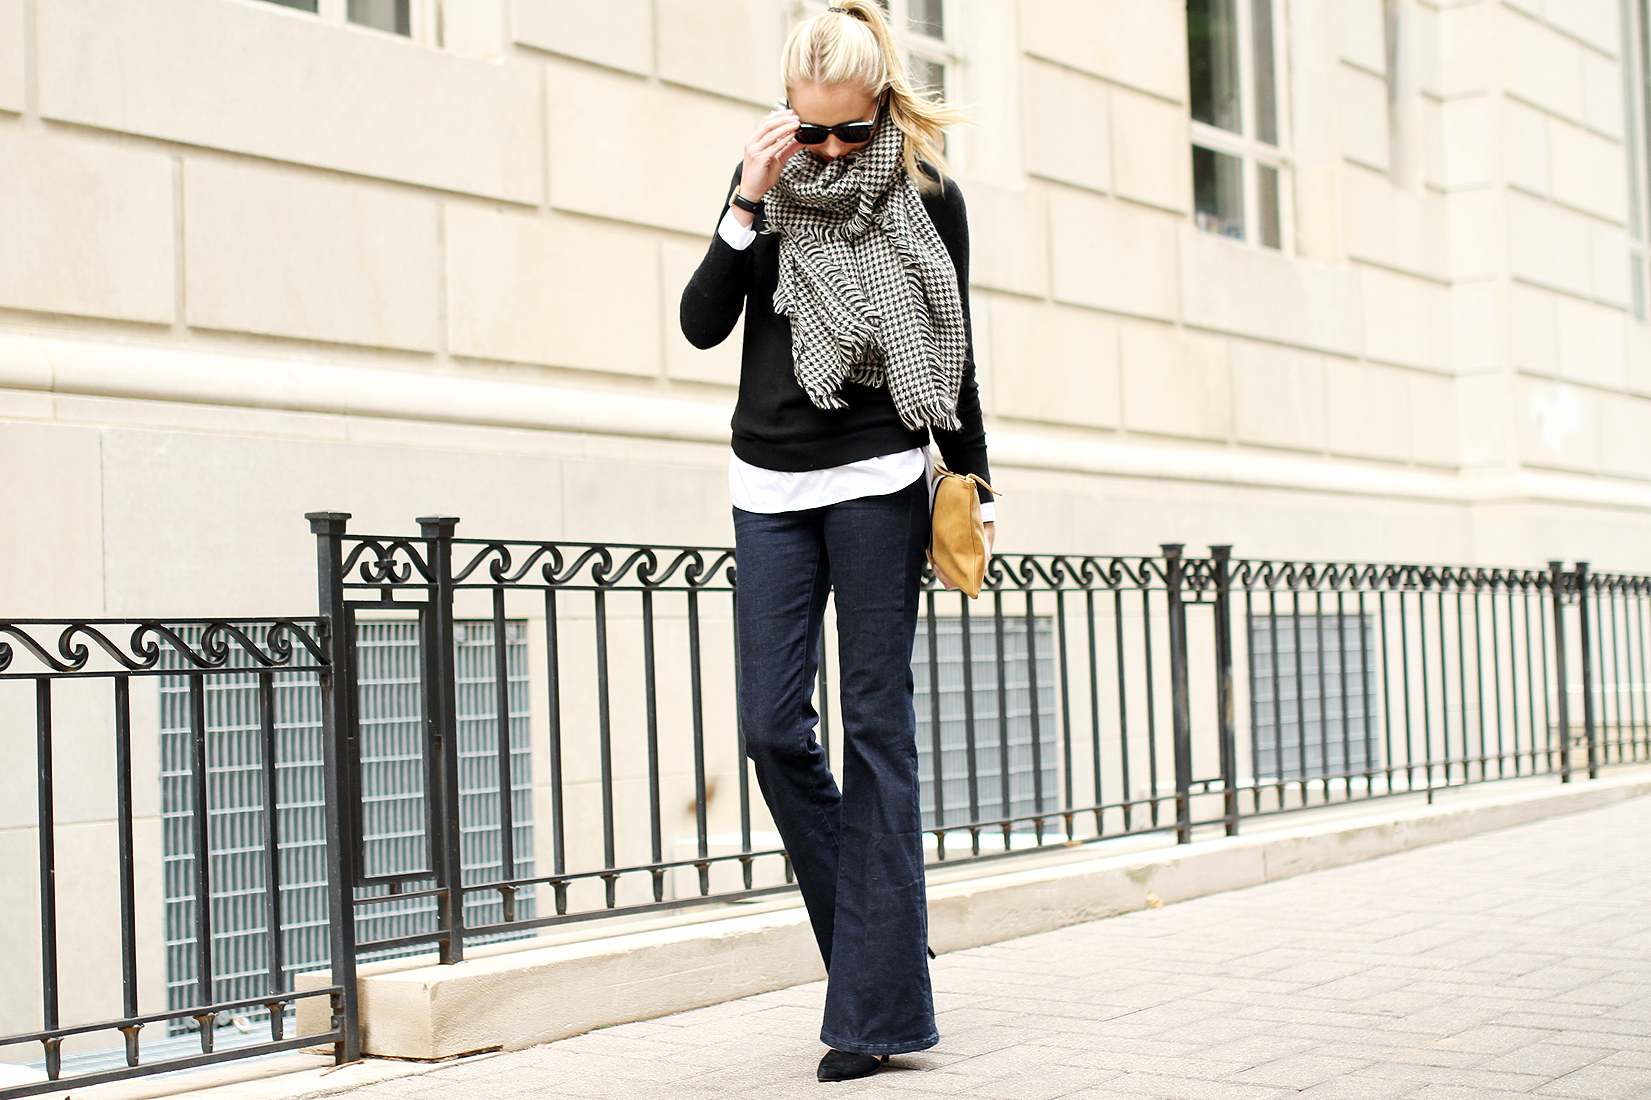 fashion-jackson-houndstooth-scarf-denim-flare-jeans-black-sweater